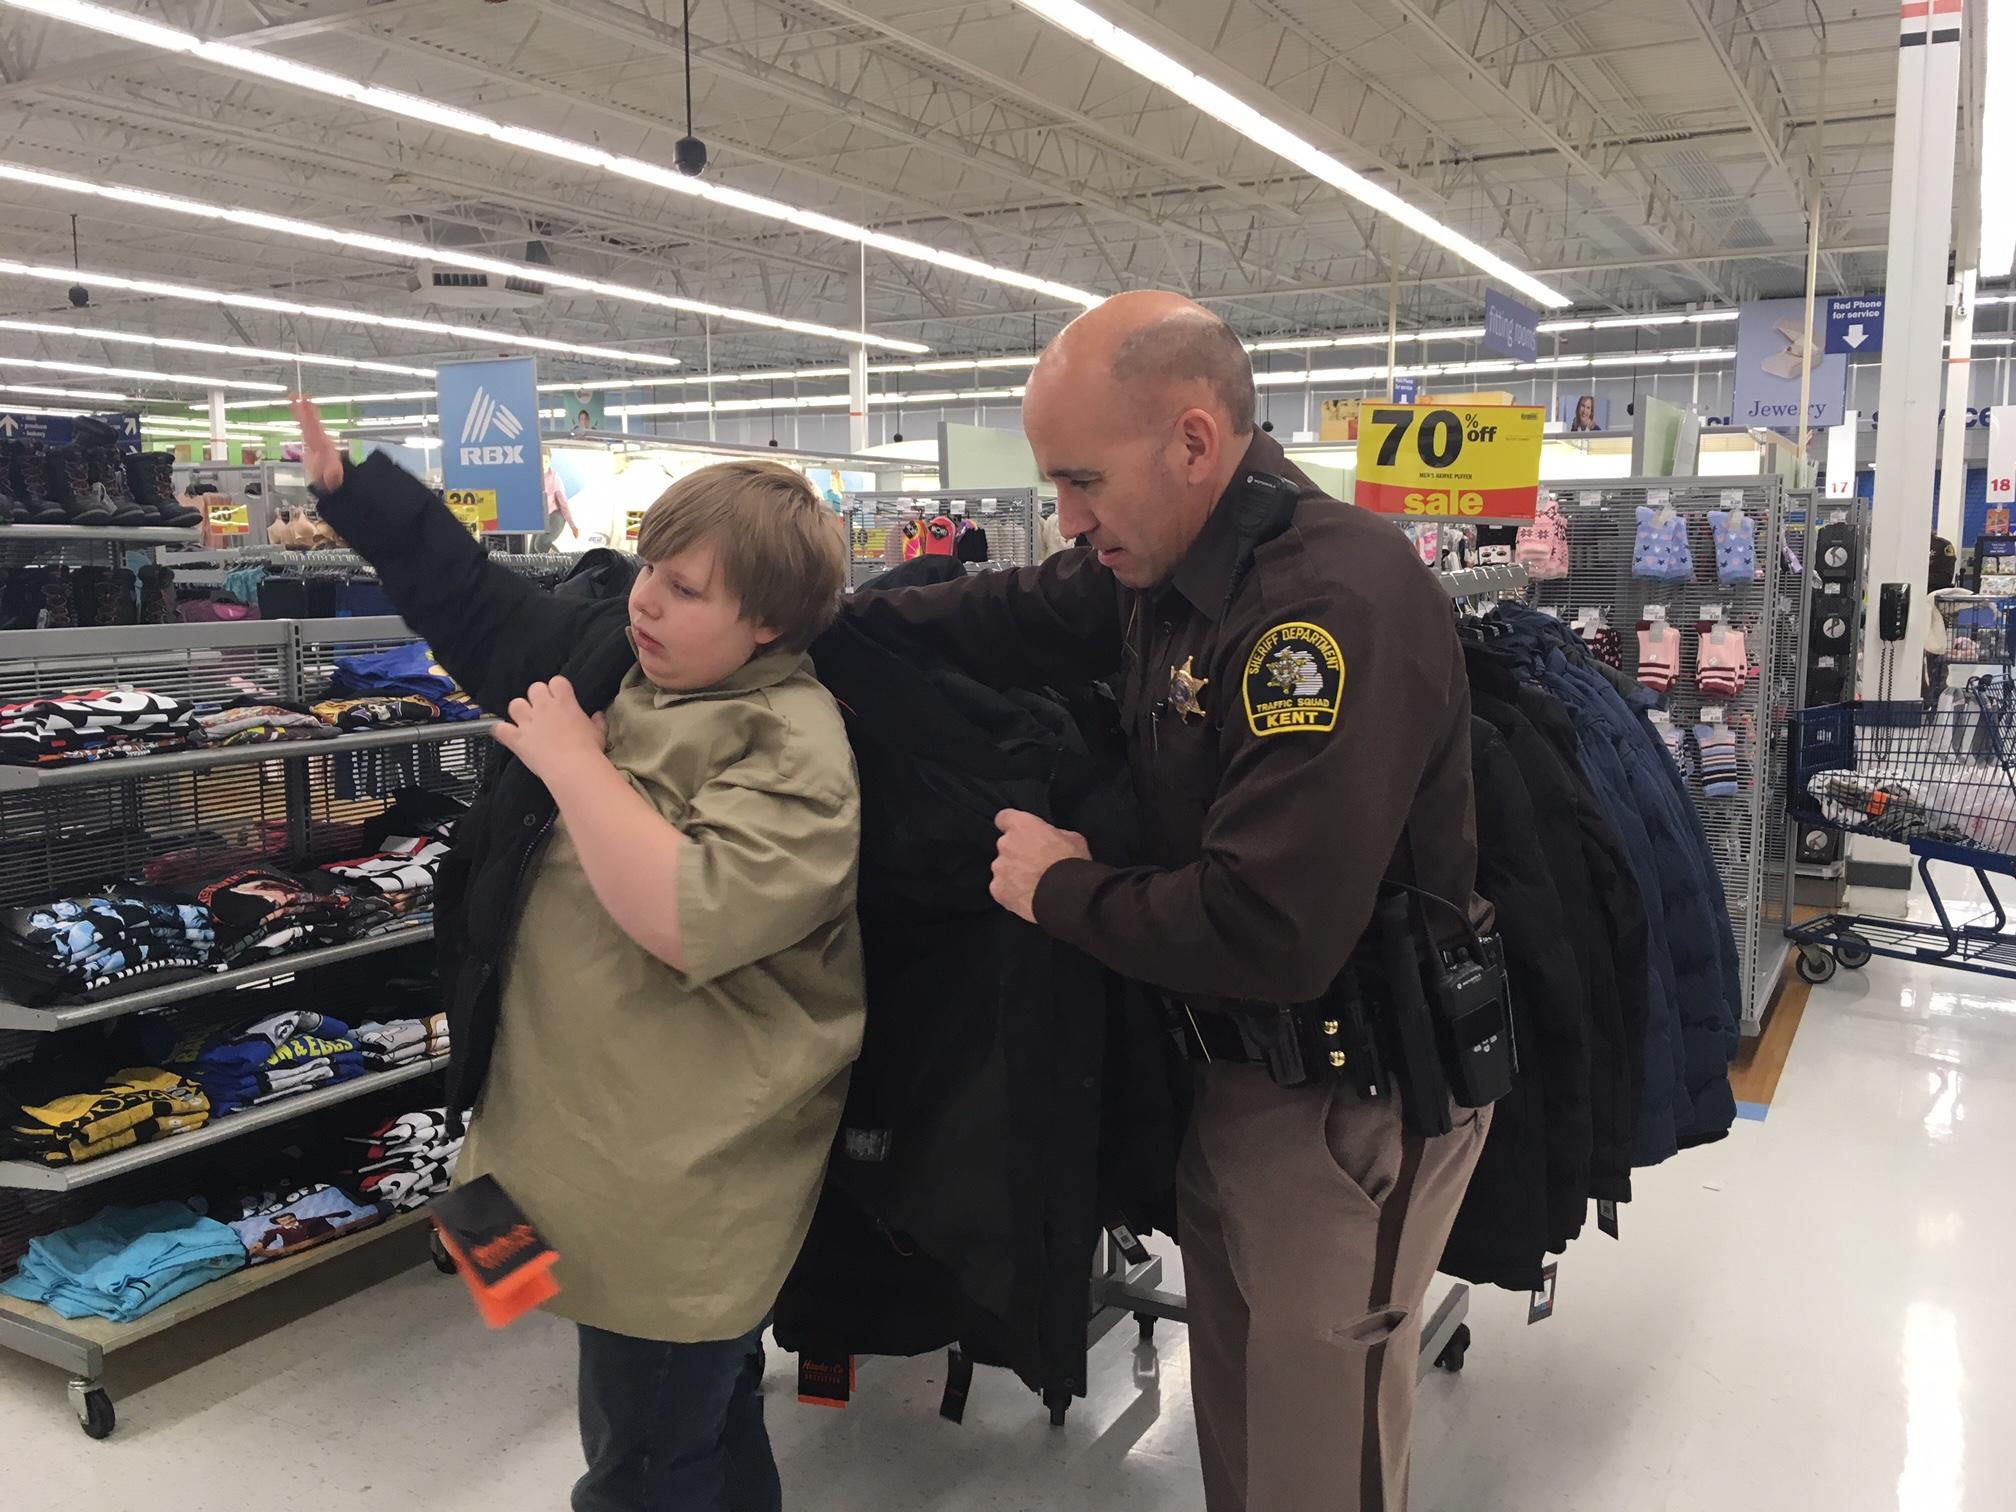 Deputy John Shumay helps Sylas Holbrook pick a warm coat.